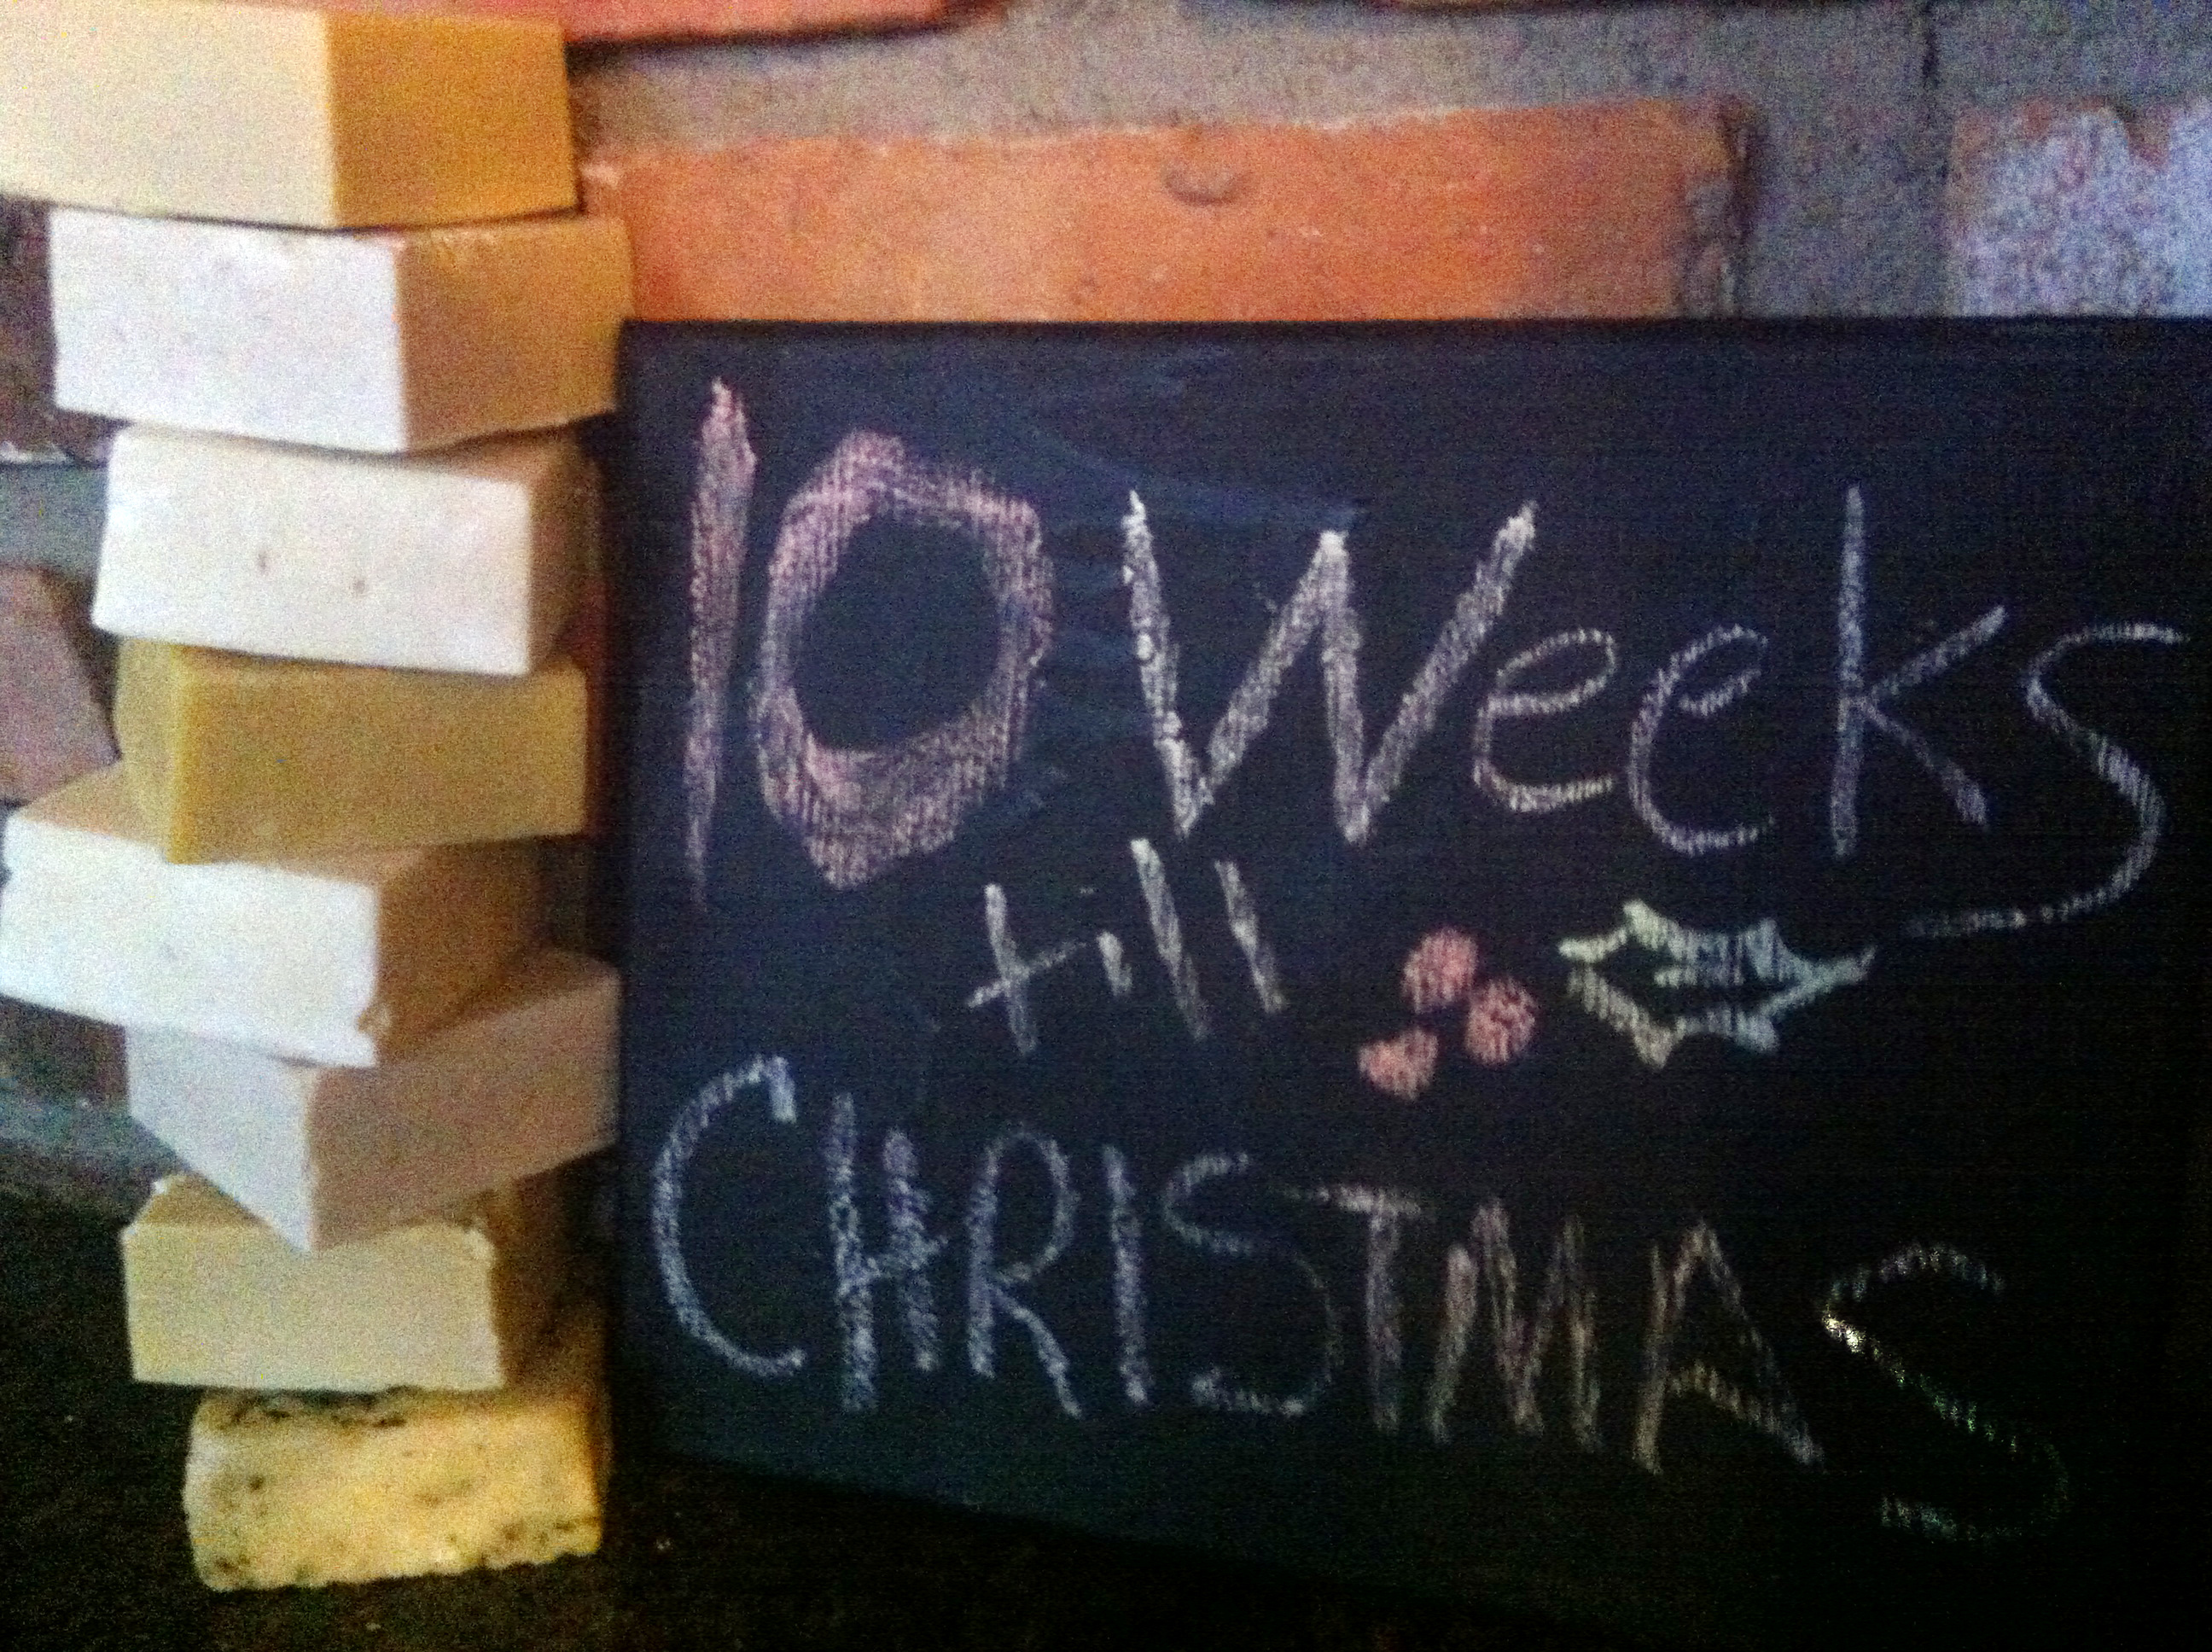 Until Christmas 10 Weeks Till Christmas.Hurry 10 Weeks Till Christmas Minnesota Goat Farm